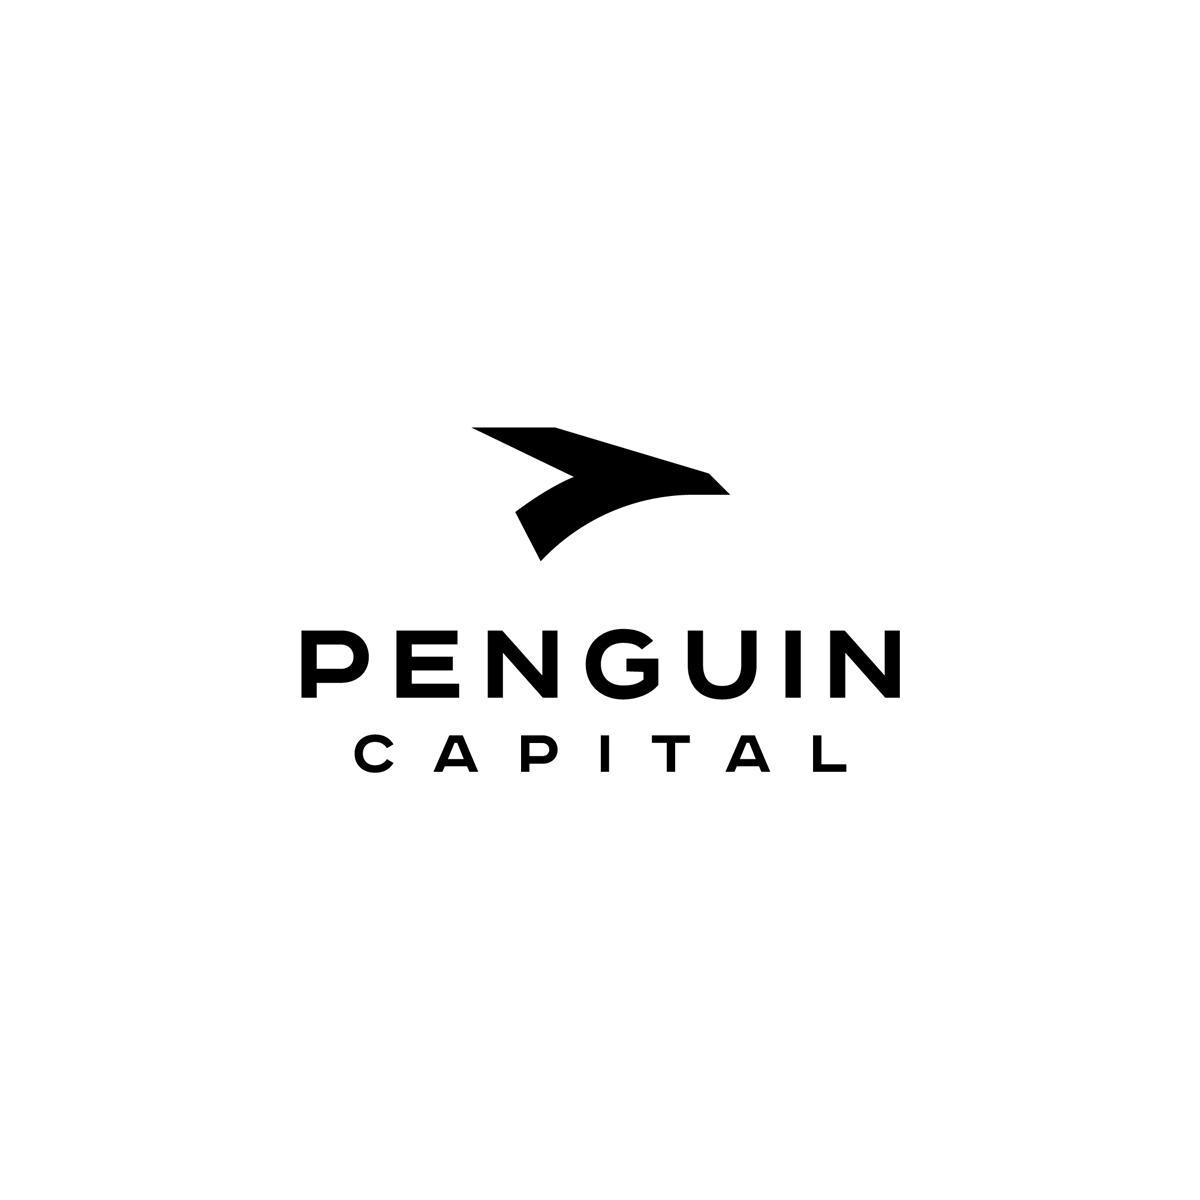 Penguin Capital needs a slightly abstract minimalist logo